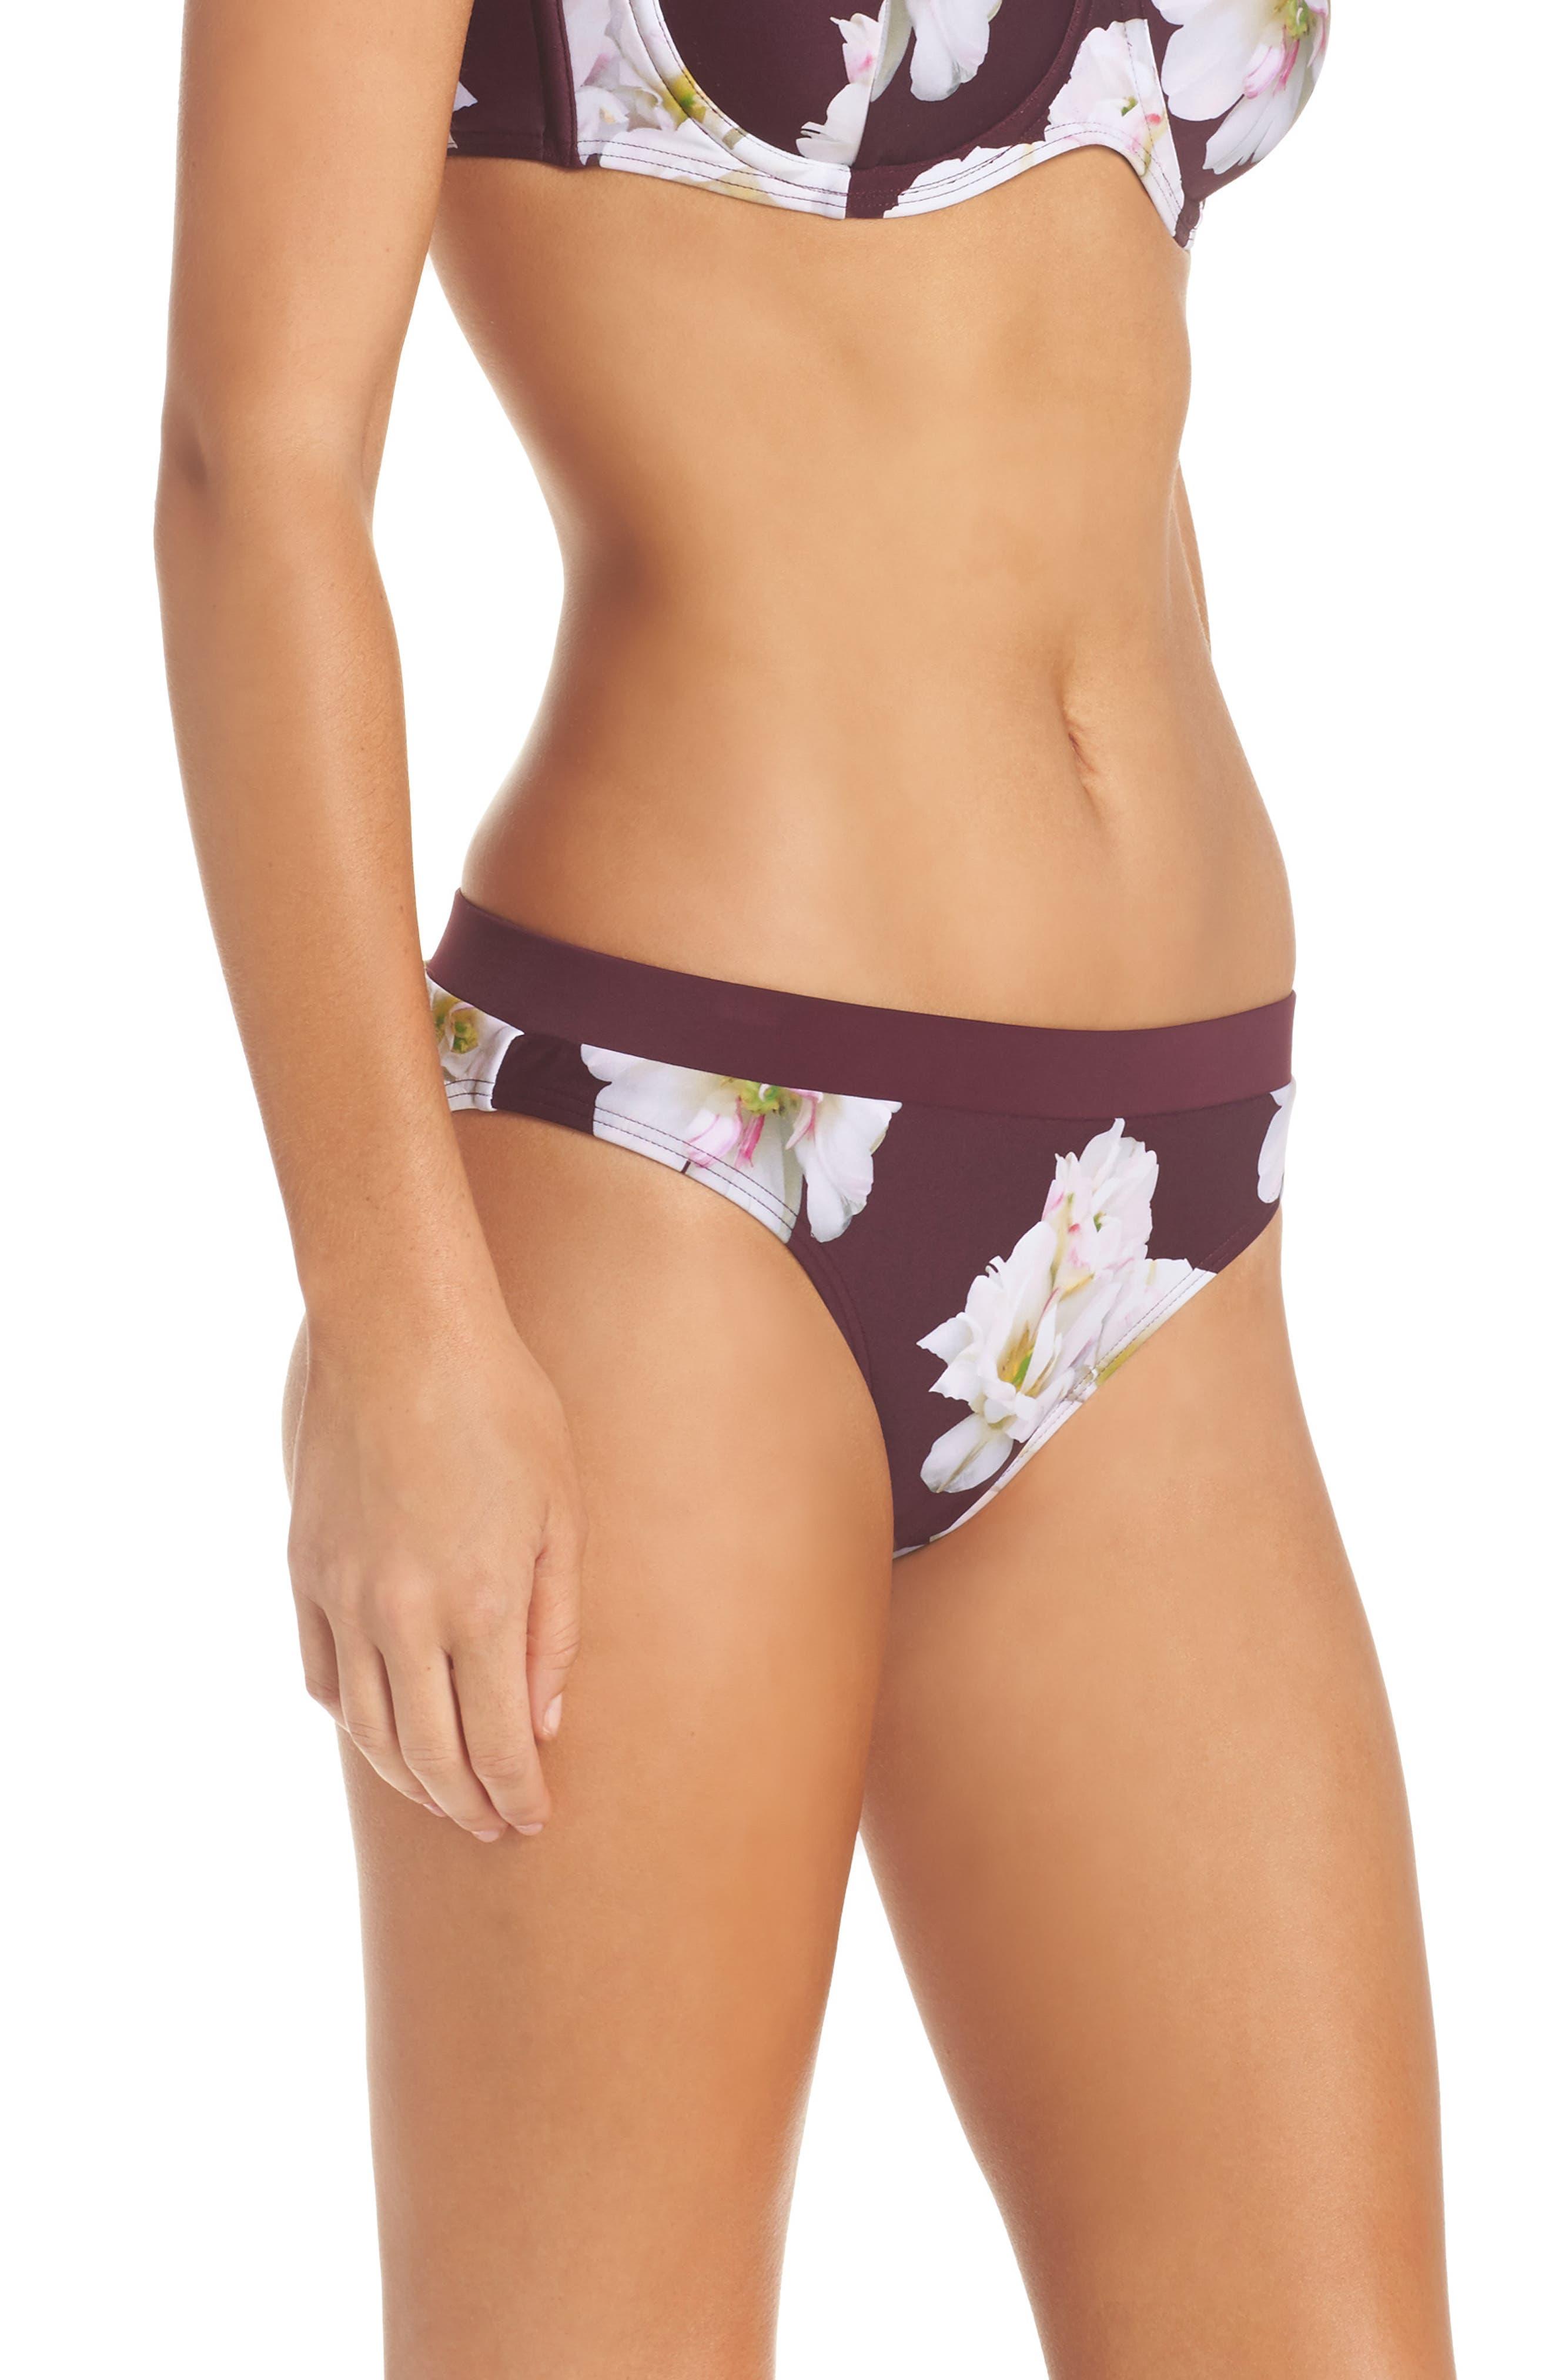 Garcela Gardenia Bikini Bottoms,                             Alternate thumbnail 3, color,                             930